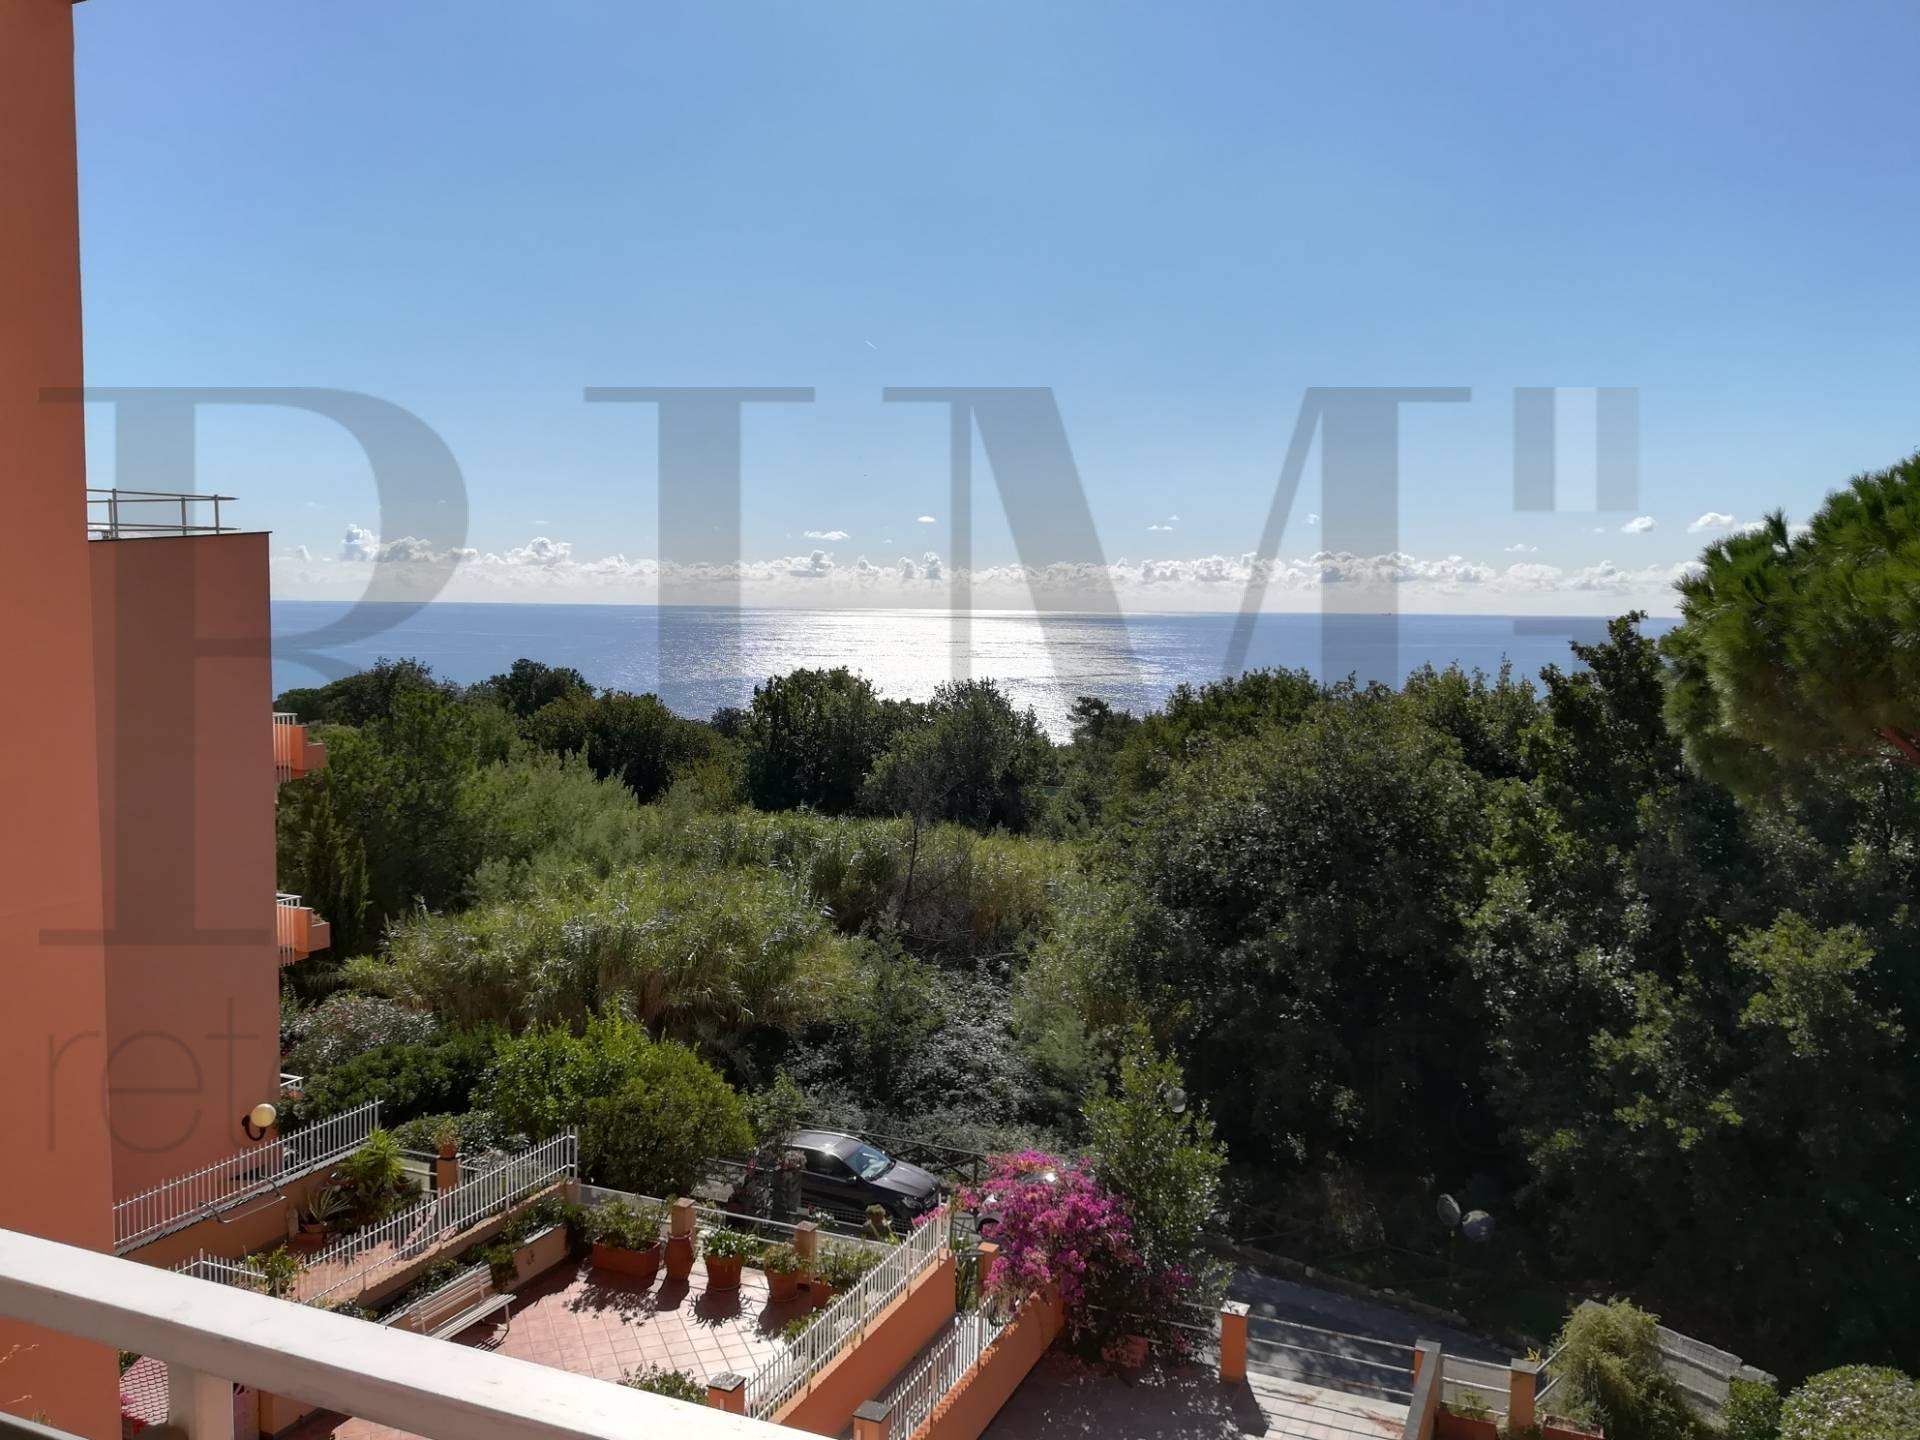 Agenzie Immobiliari Varazze in sale to varazze ref. sat-vagp7